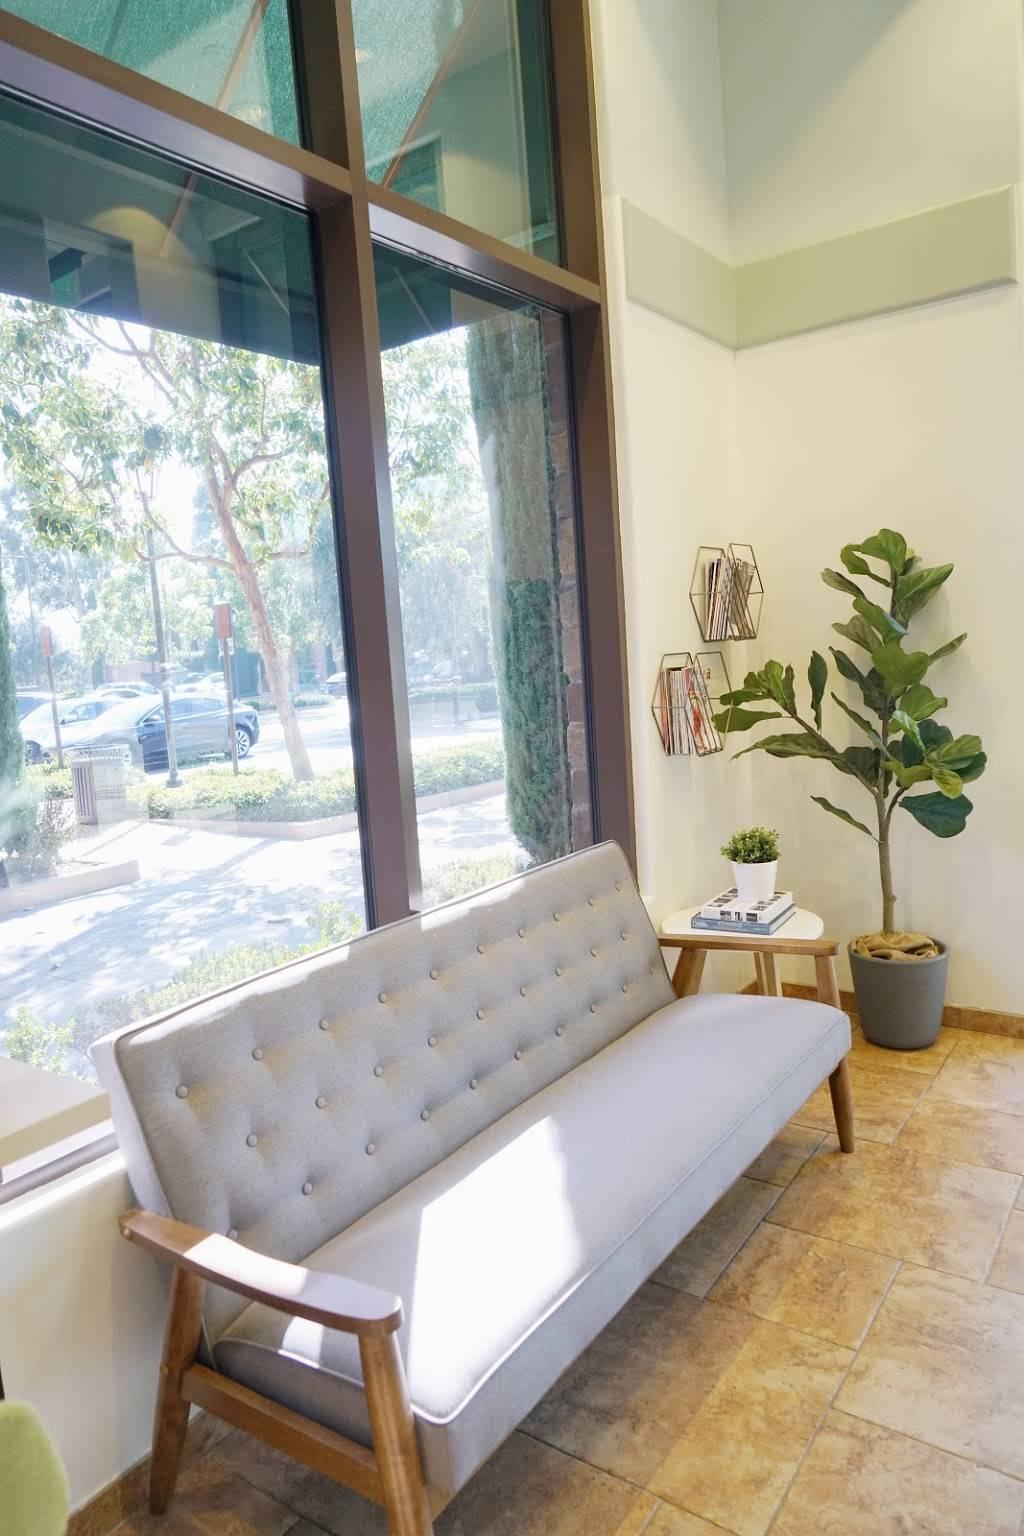 Mint Orthodontics - dentist  | Photo 4 of 7 | Address: 3963 Portola Pkwy, Irvine, CA 92602, USA | Phone: (714) 544-5544